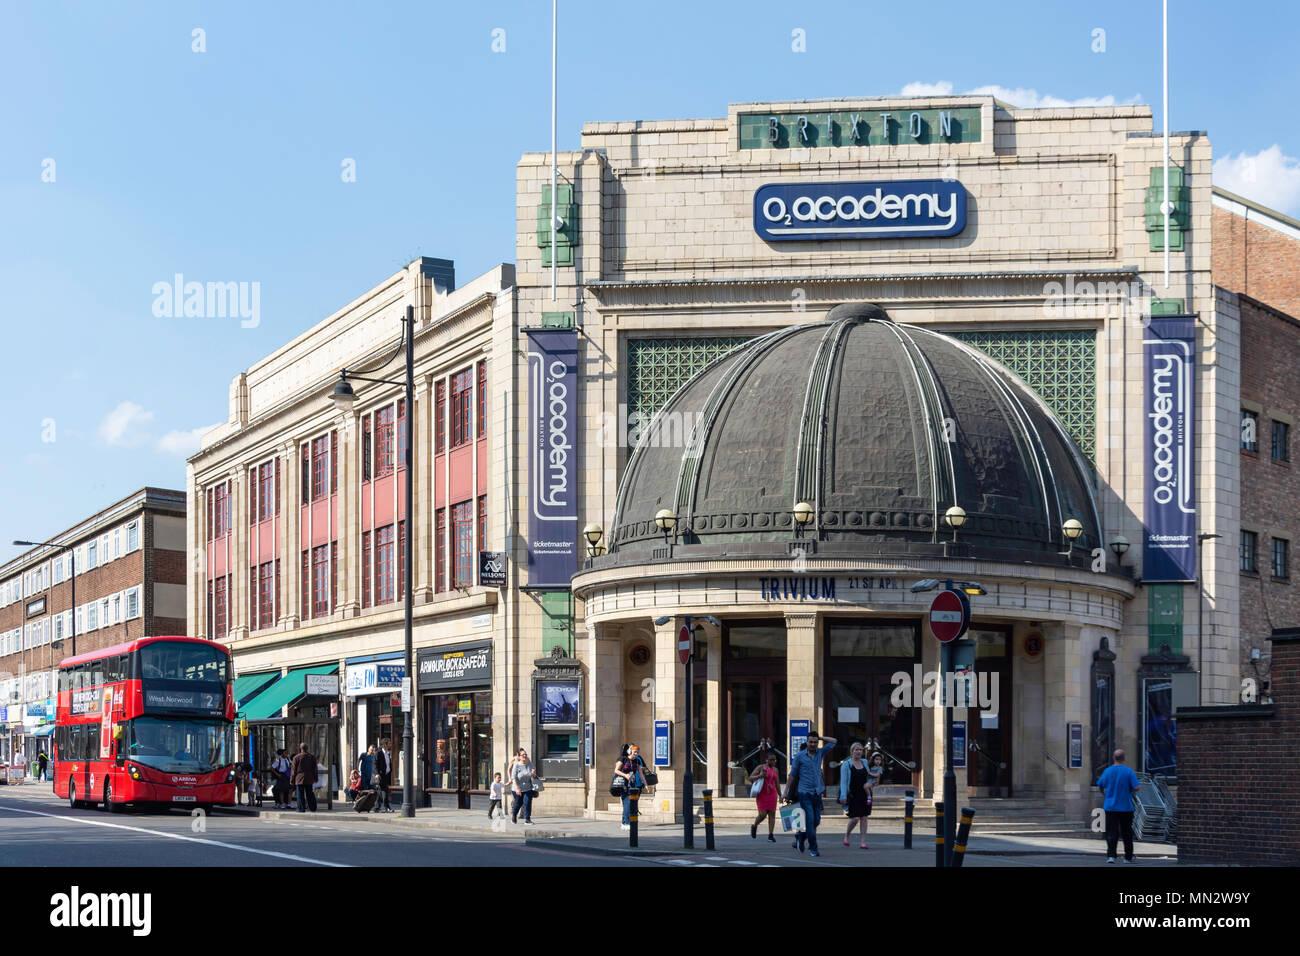 O2 Academy Brixton, Stockwell Road, Brixton, London Borough of Lambeth, Greater London, England, United Kingdom - Stock Image